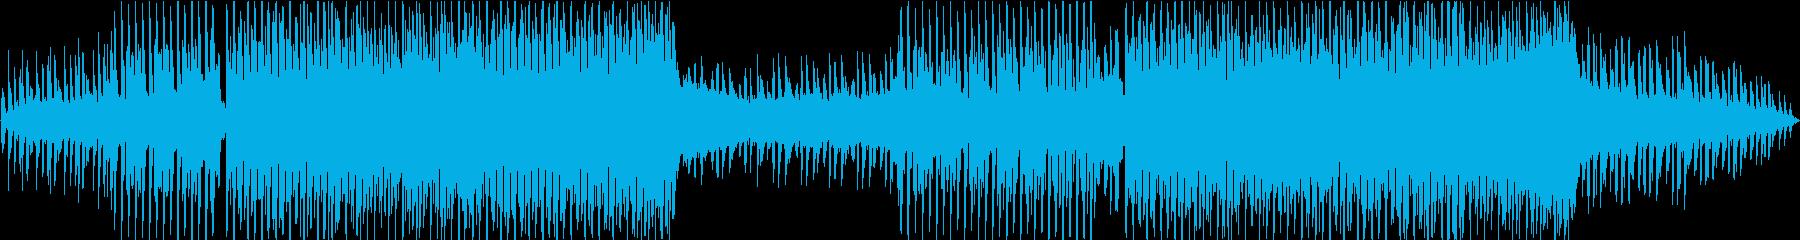 Stylish soft summer EDM's reproduced waveform